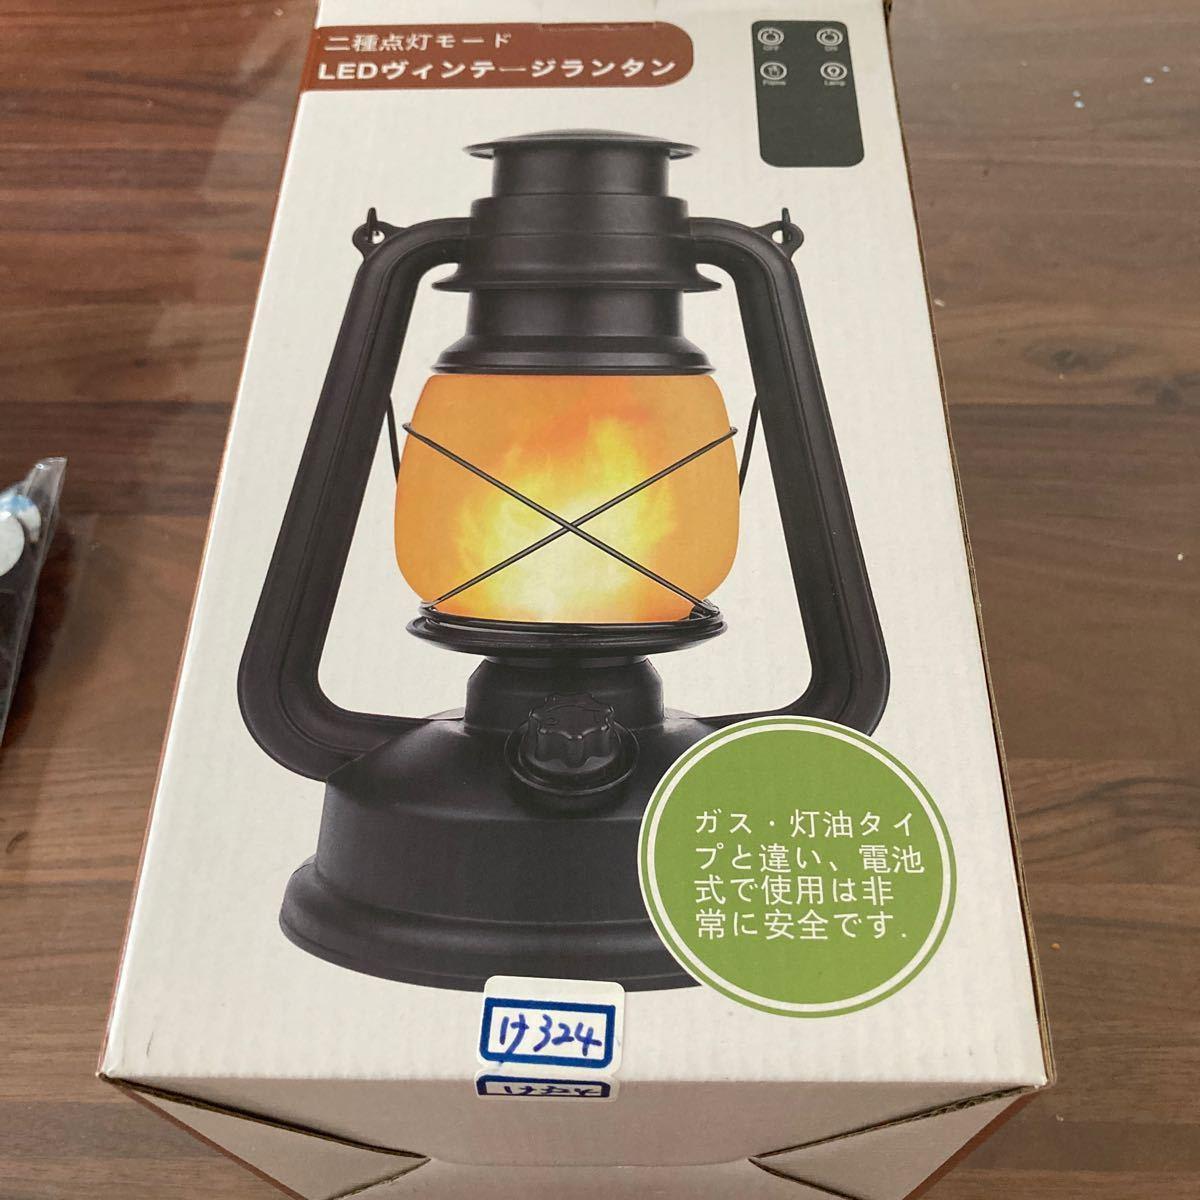 LEDランタン グランピング ゆられる 火炎効果 高輝度 キャンプランタン 2つモード 昼白色と電球色切替 吊り 電池式 明るい リモコンを付き